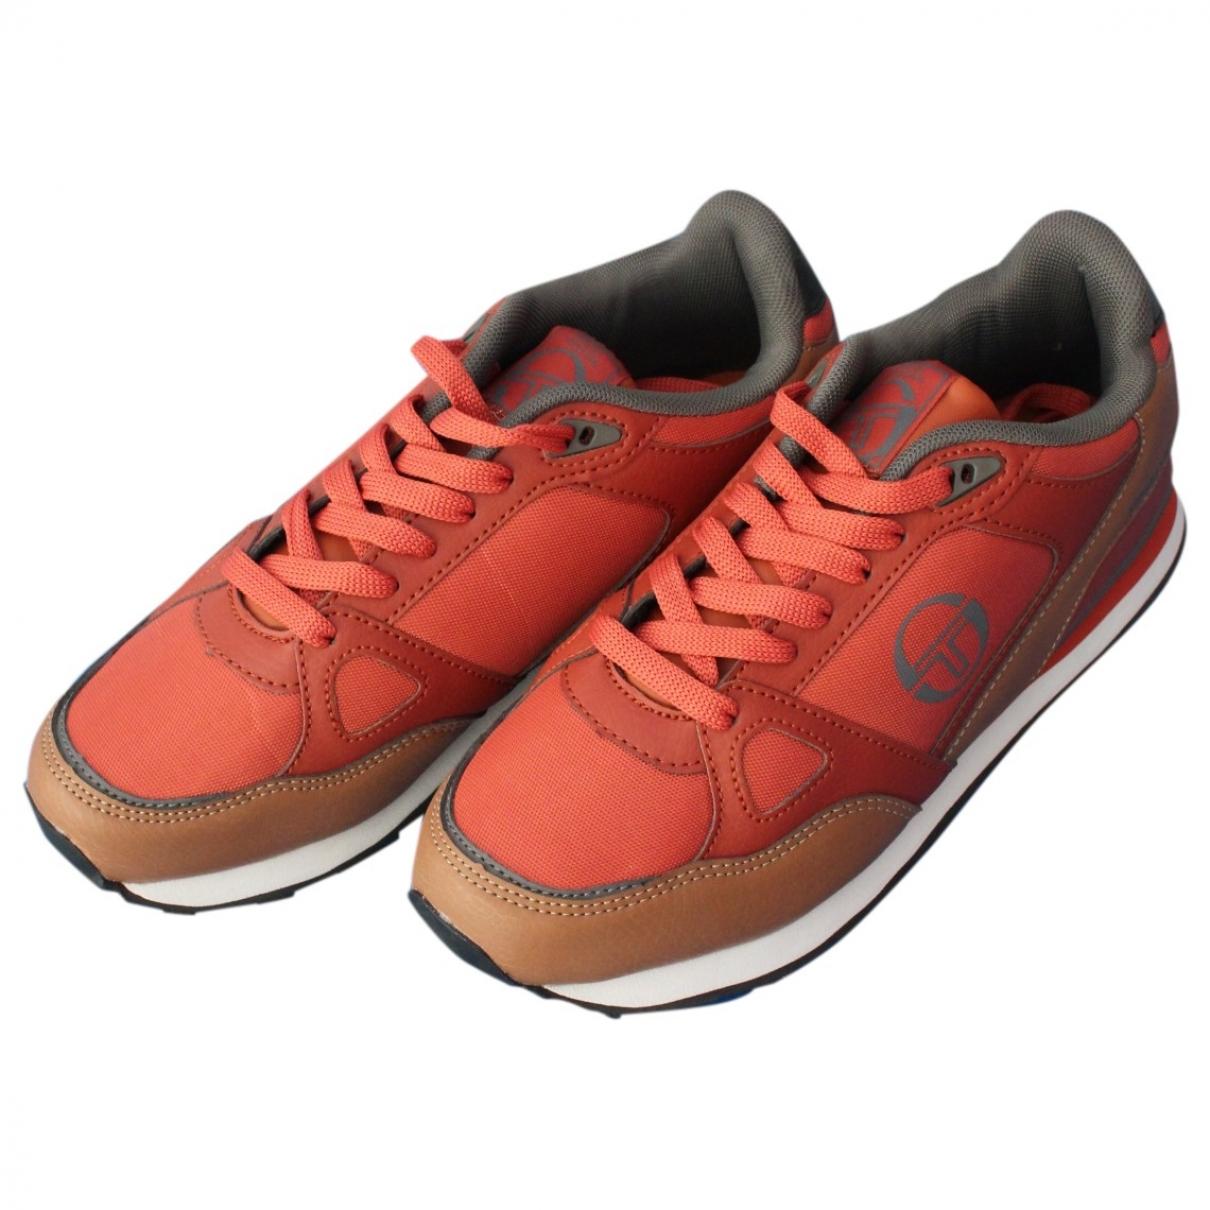 Sergio Tacchini - Baskets   pour homme en toile - orange